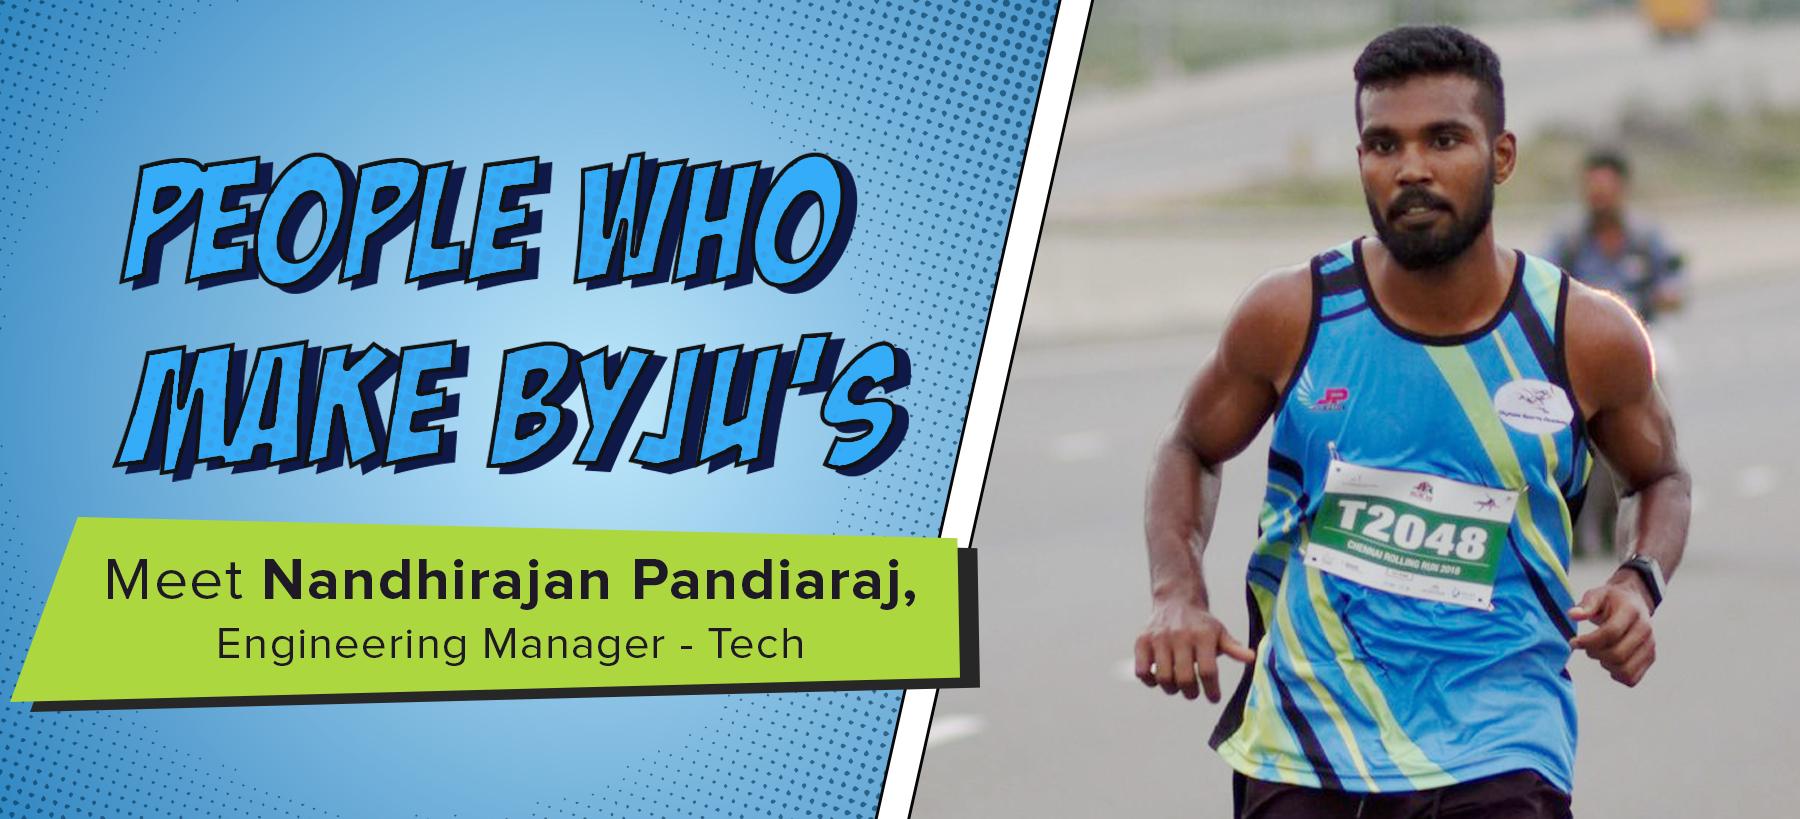 Nadhirajan Pandiaraj, Engineering Manager at BYJU'S